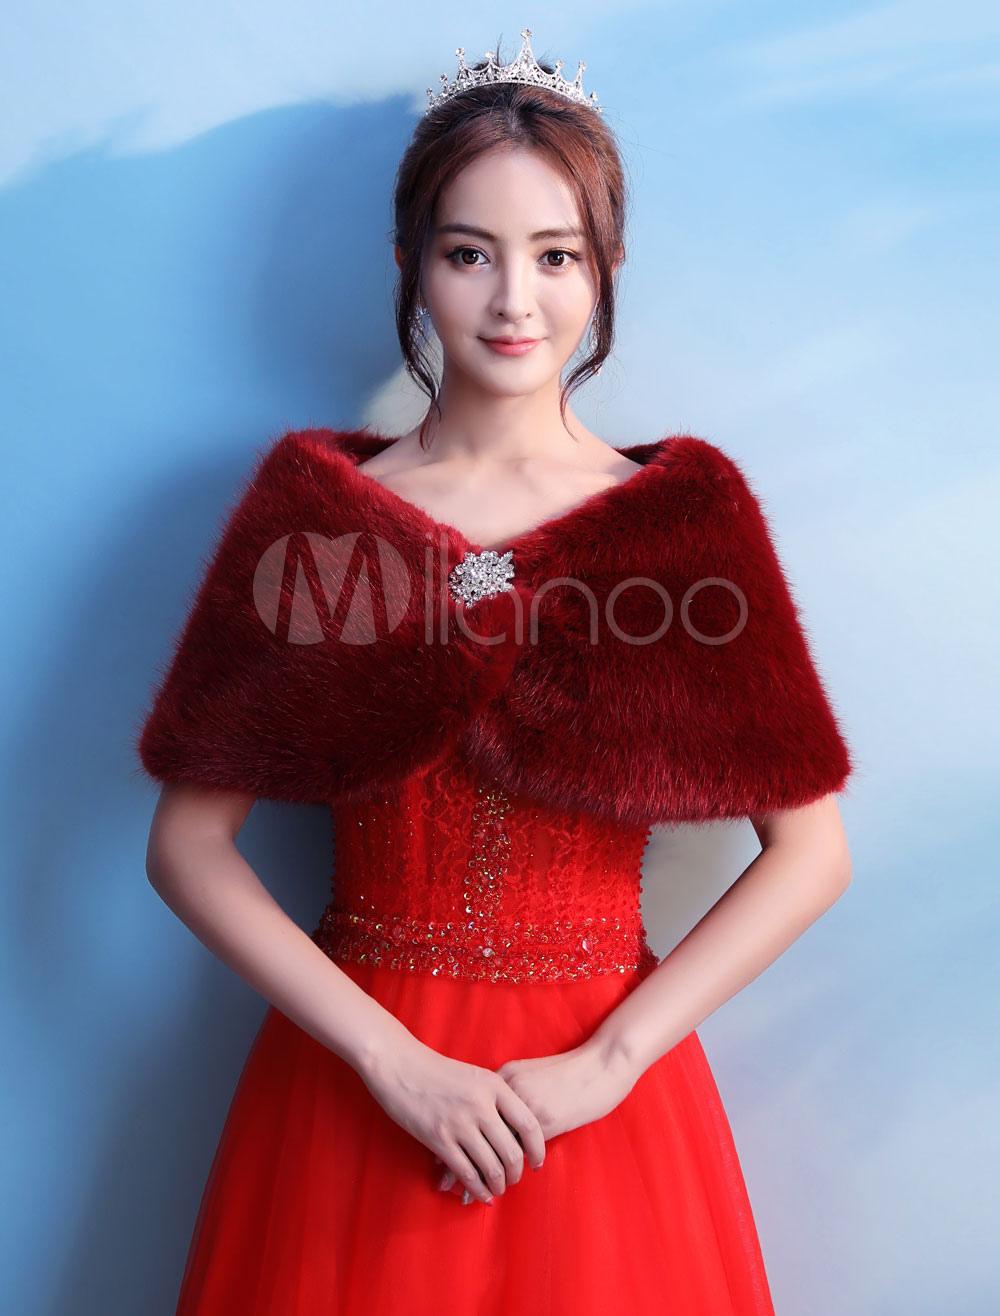 Burgundy Fur Stole Wedding Jacket Bolero Bridal Tops Party Cover Ups